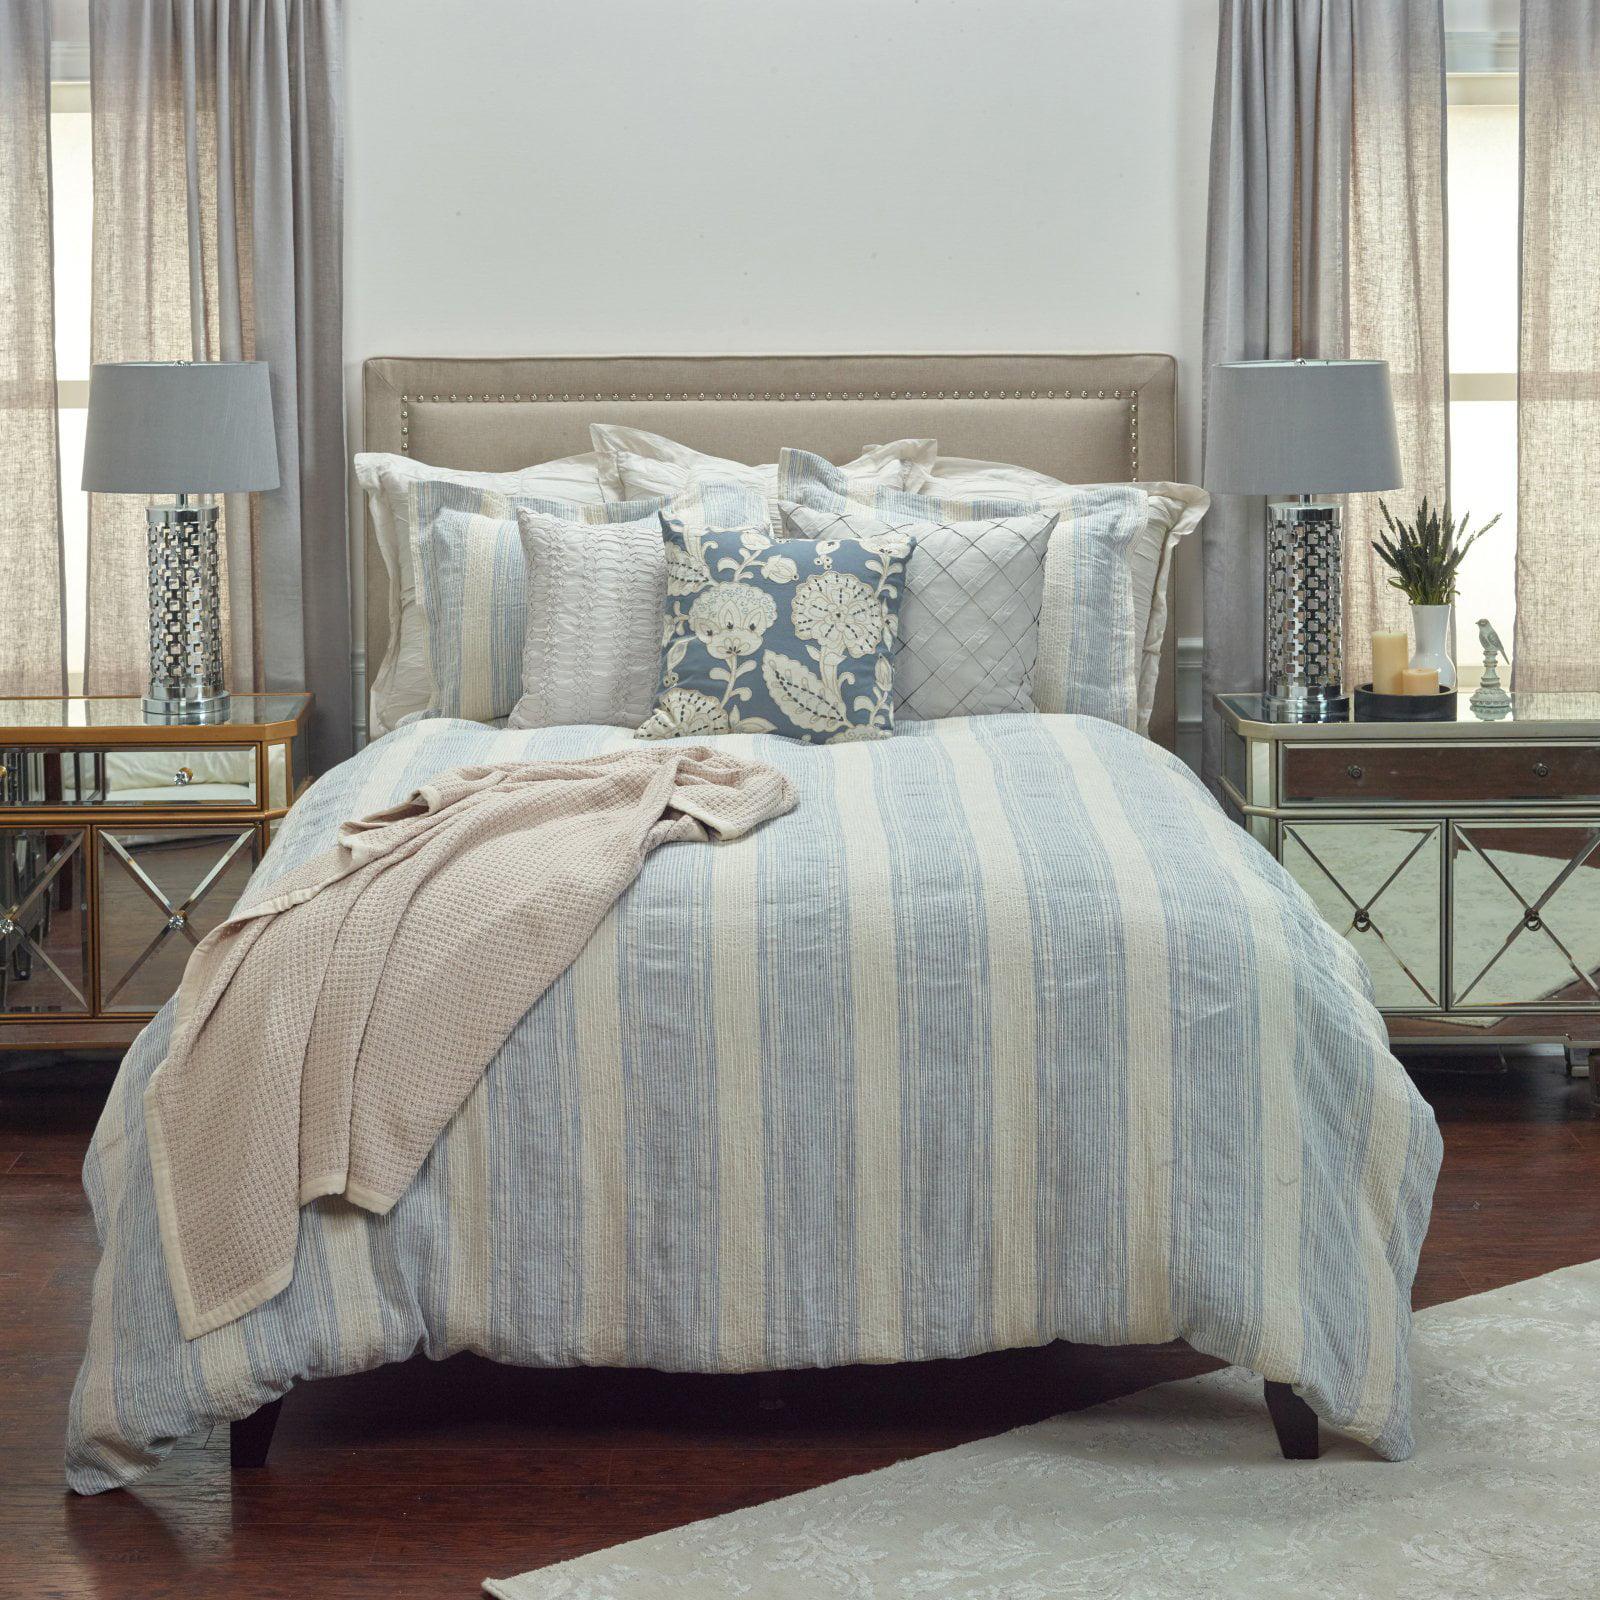 "Rizzy Home Prescott Preserve Blue Linen Duvet Bedding Cover 114"" x 98"""